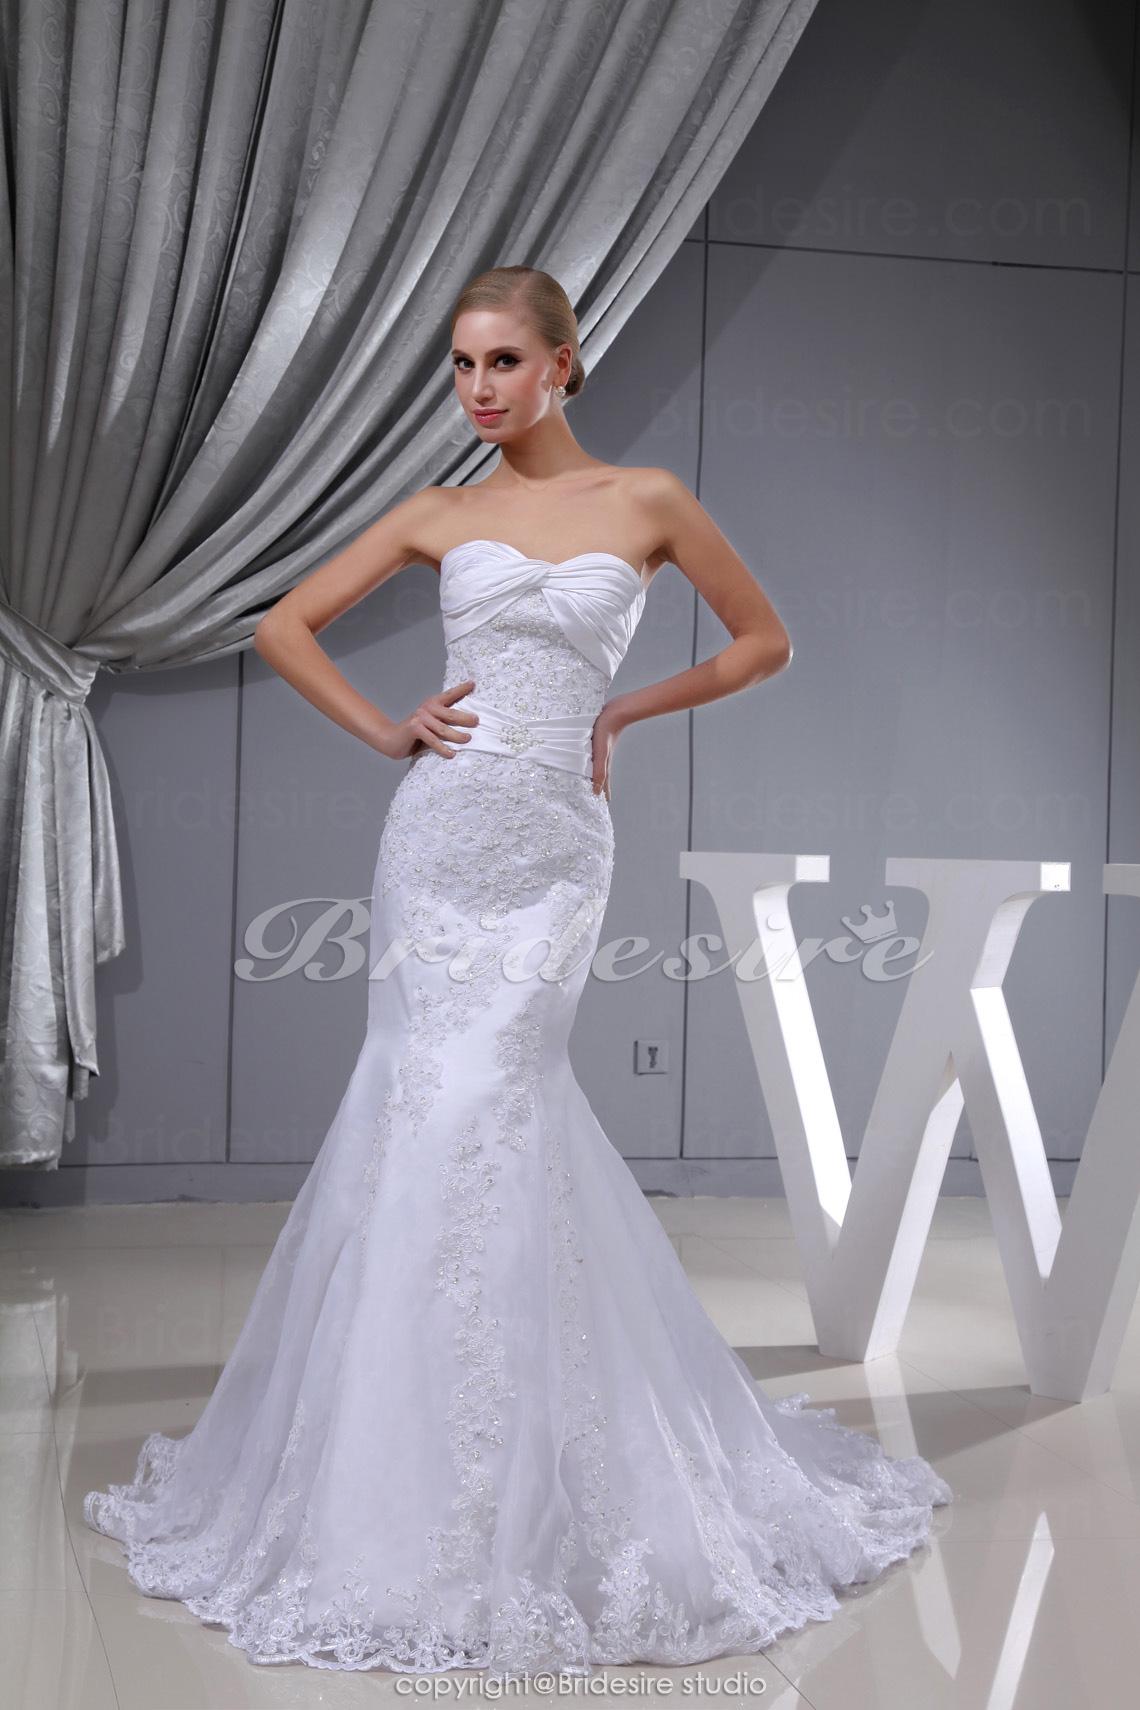 301f08d3e37aa3 Bridesire - Meerjungfrau-Linie / Mermaid-Stil trägerloser Ausschnitt Sweep/Pinsel  Zug ärmellos Spitzen Satin [BDH1344] - €179.19 : Bridesire